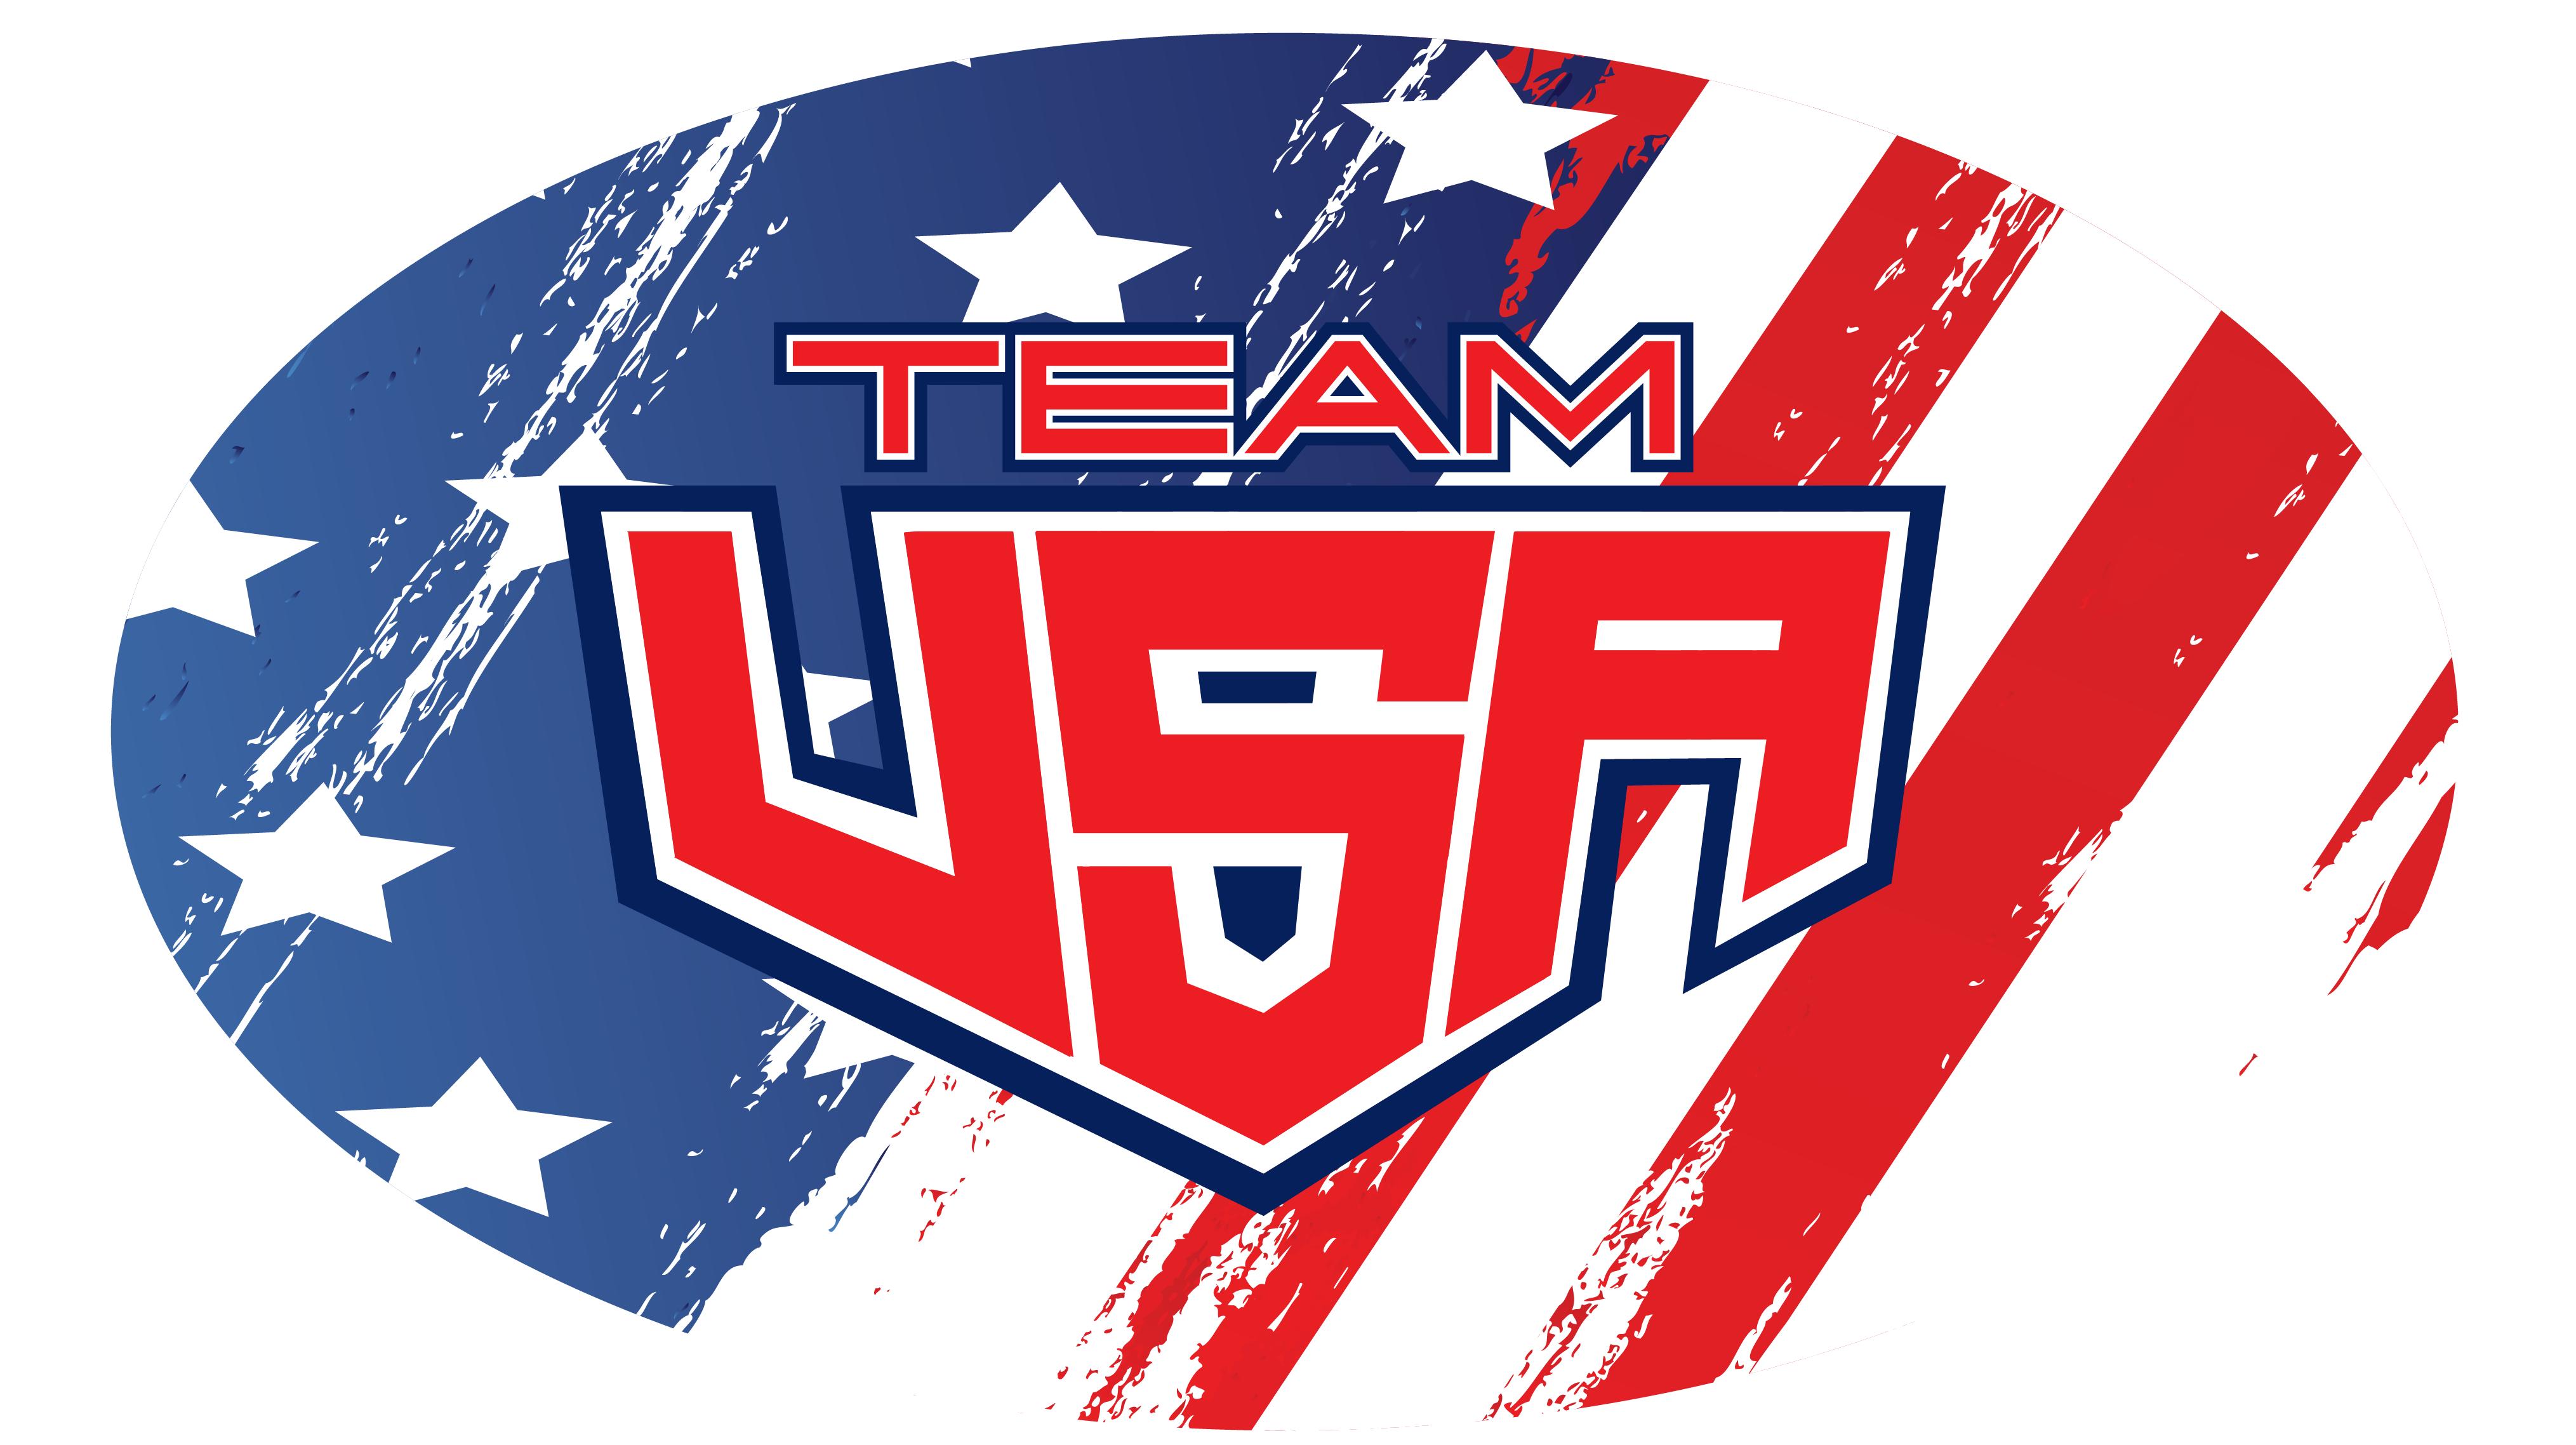 (Team_USA_Generic_21.png)